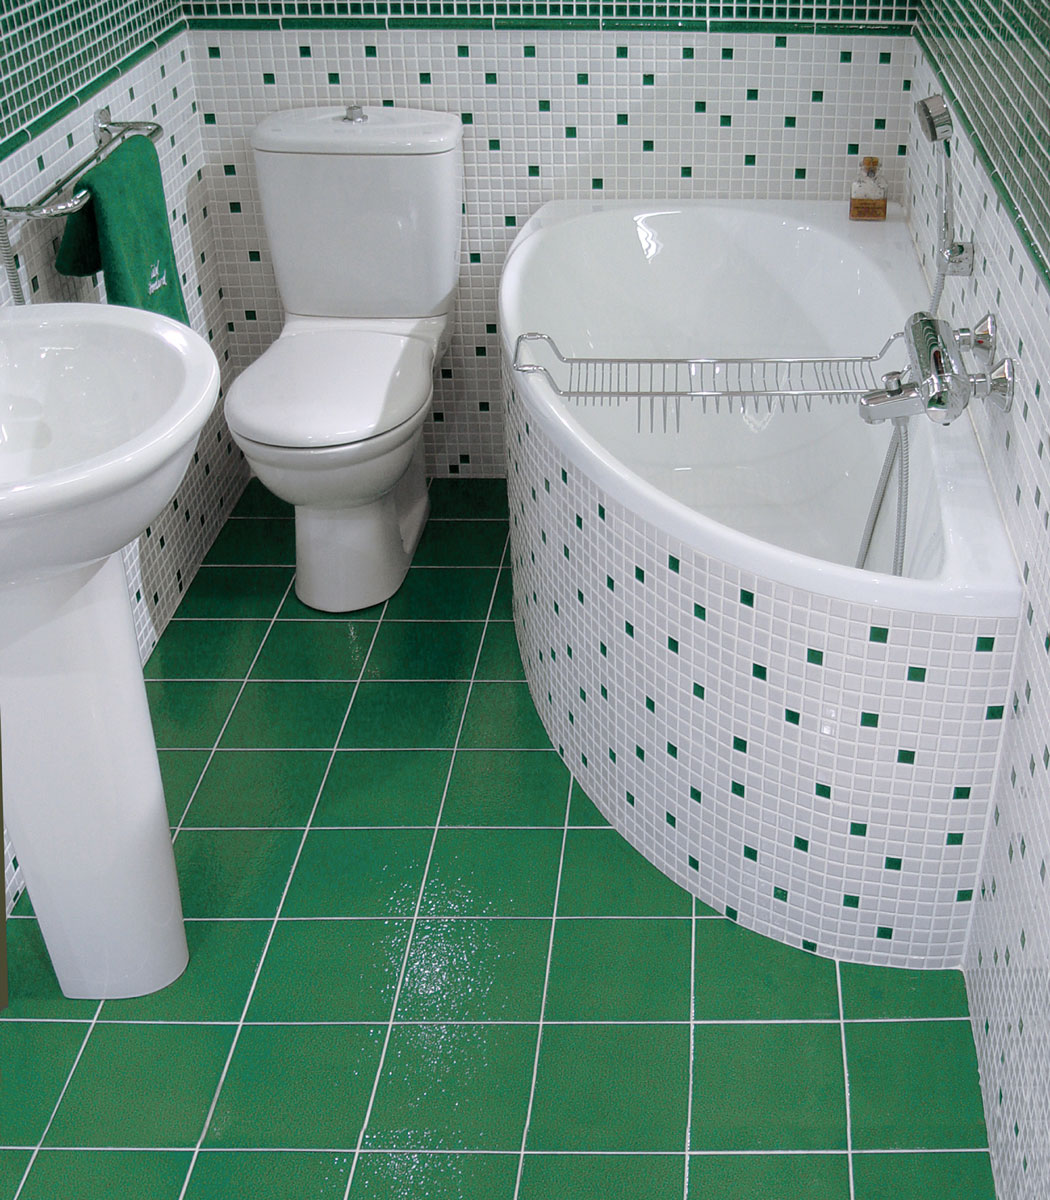 Ванная комната - подбираем дизайн ...: uhouse.ru/bathroom/5189-vannaja-komnata-podbiraem-dizajjn.html